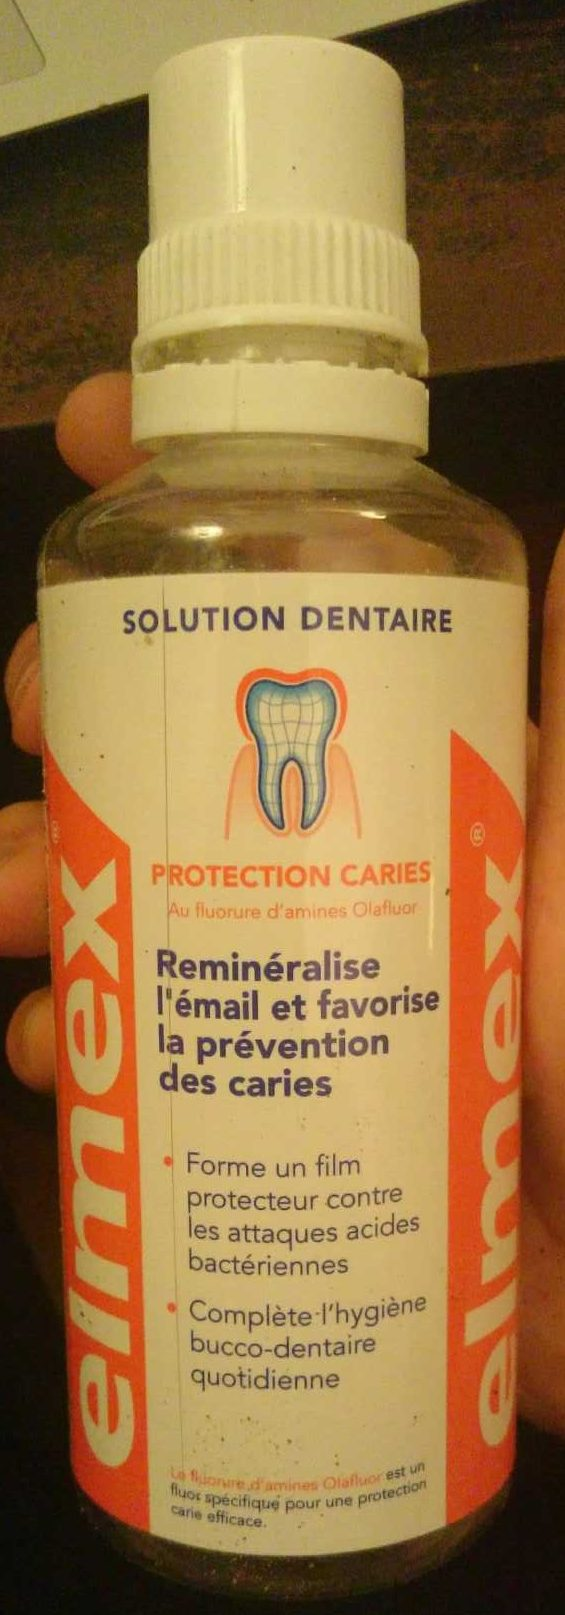 Protection carries - Produit - fr